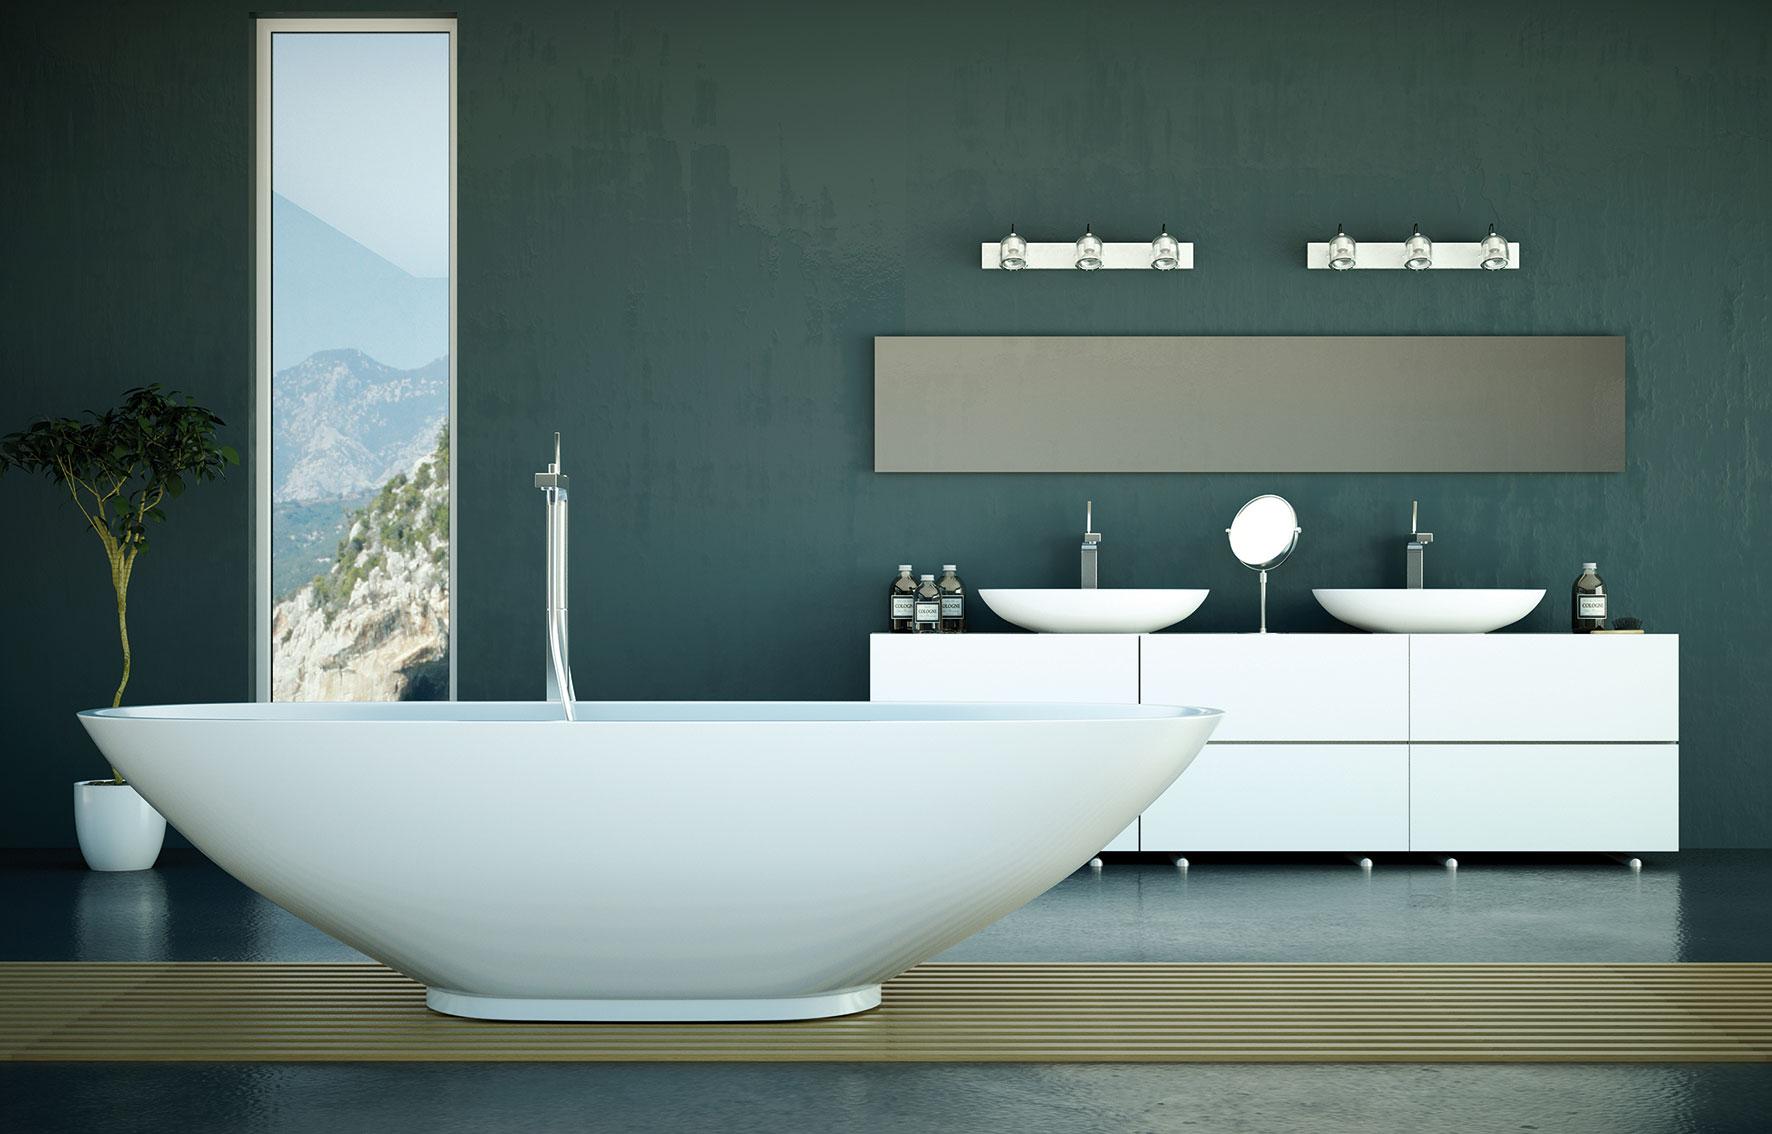 lakesite estate markdorf leimbach clever wohnen auf 132m. Black Bedroom Furniture Sets. Home Design Ideas